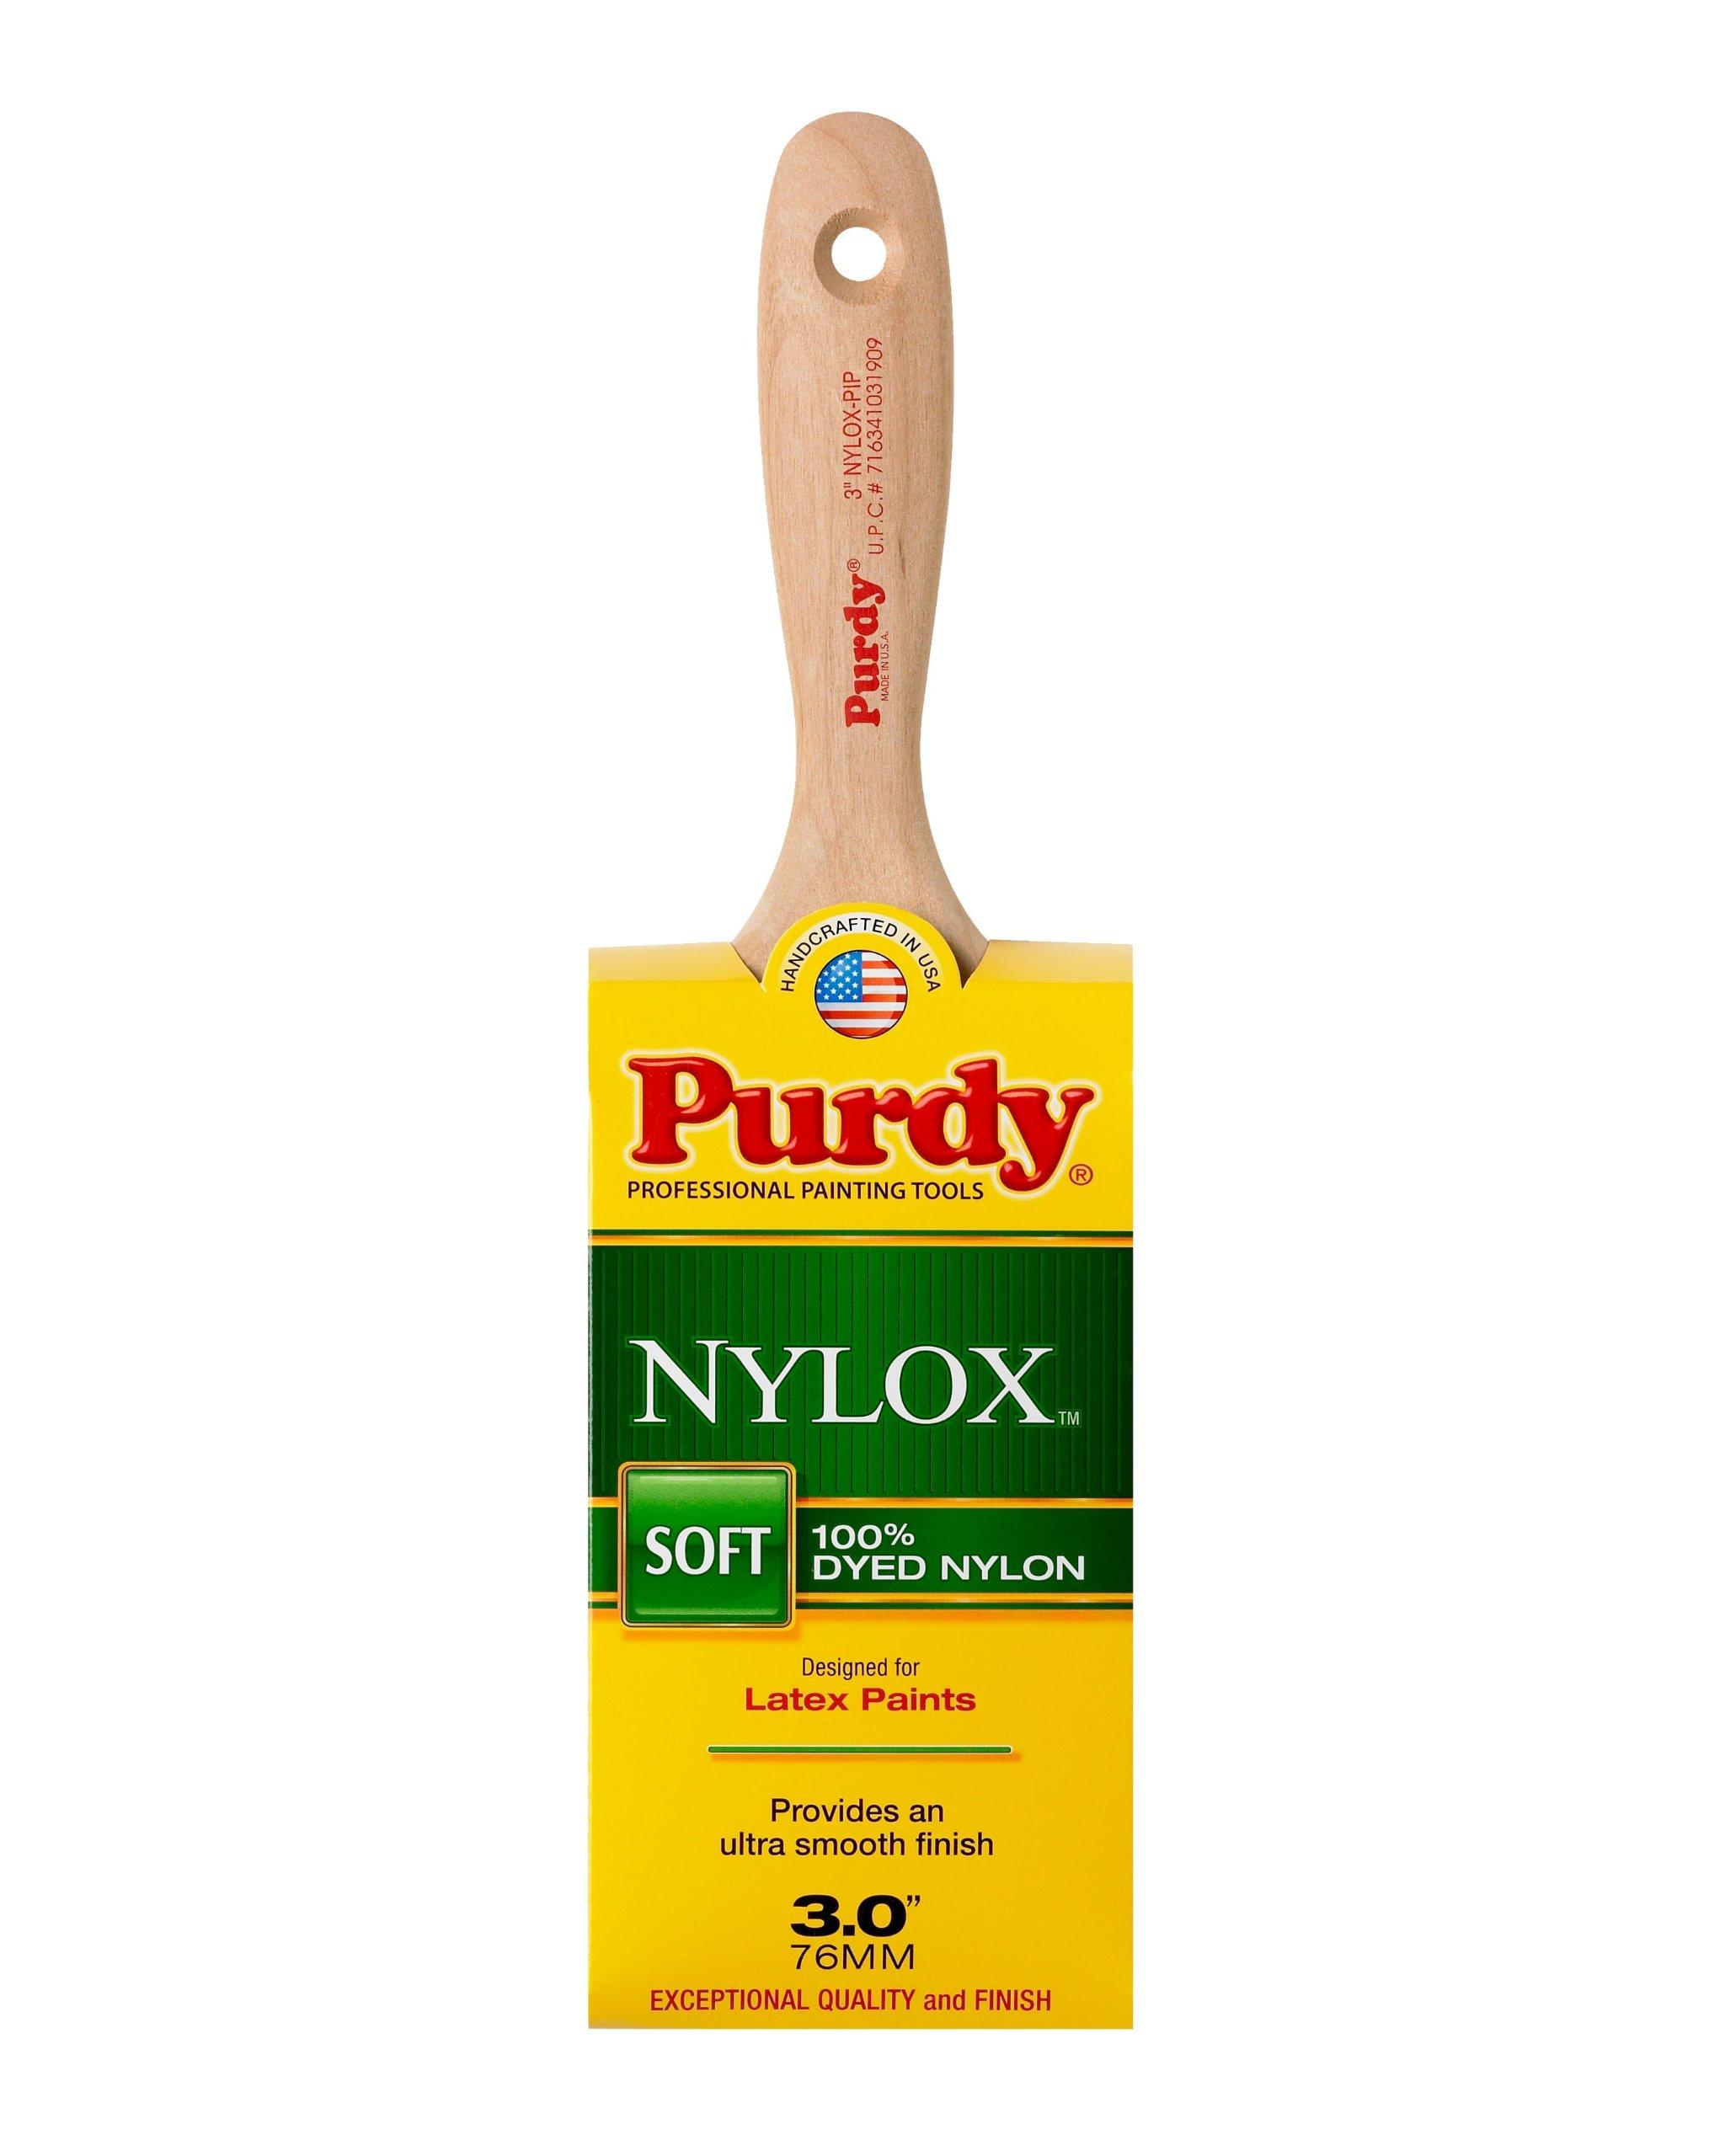 Purdy 144324230 Nylox Enamel/Wall Pip Brush (Case of 6), 3''